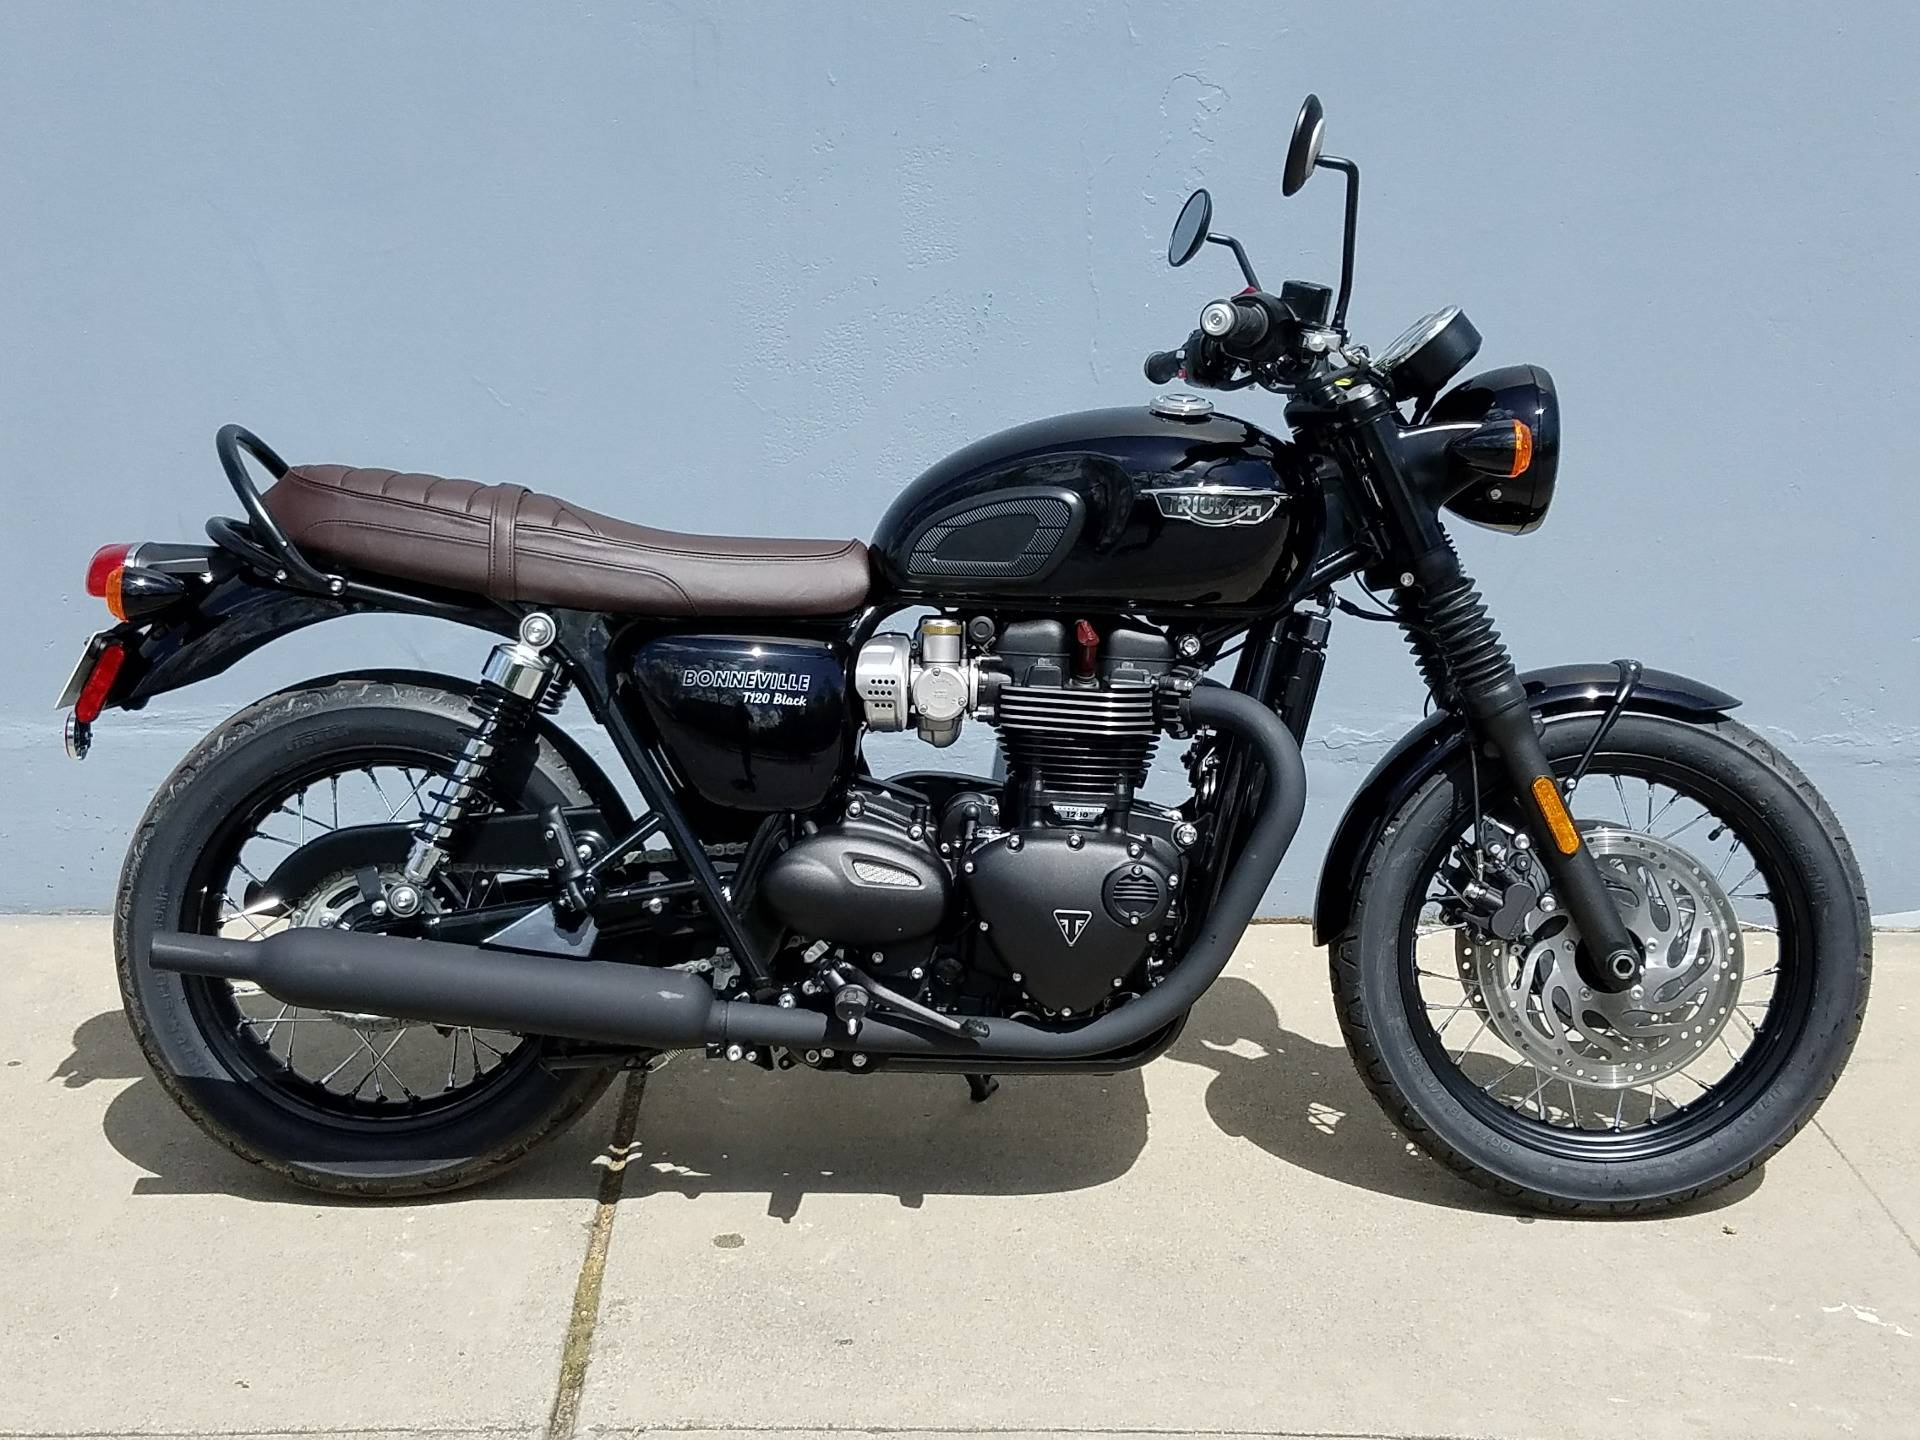 New 2019 Triumph Bonneville T120 Black Motorcycles In San Jose Ca